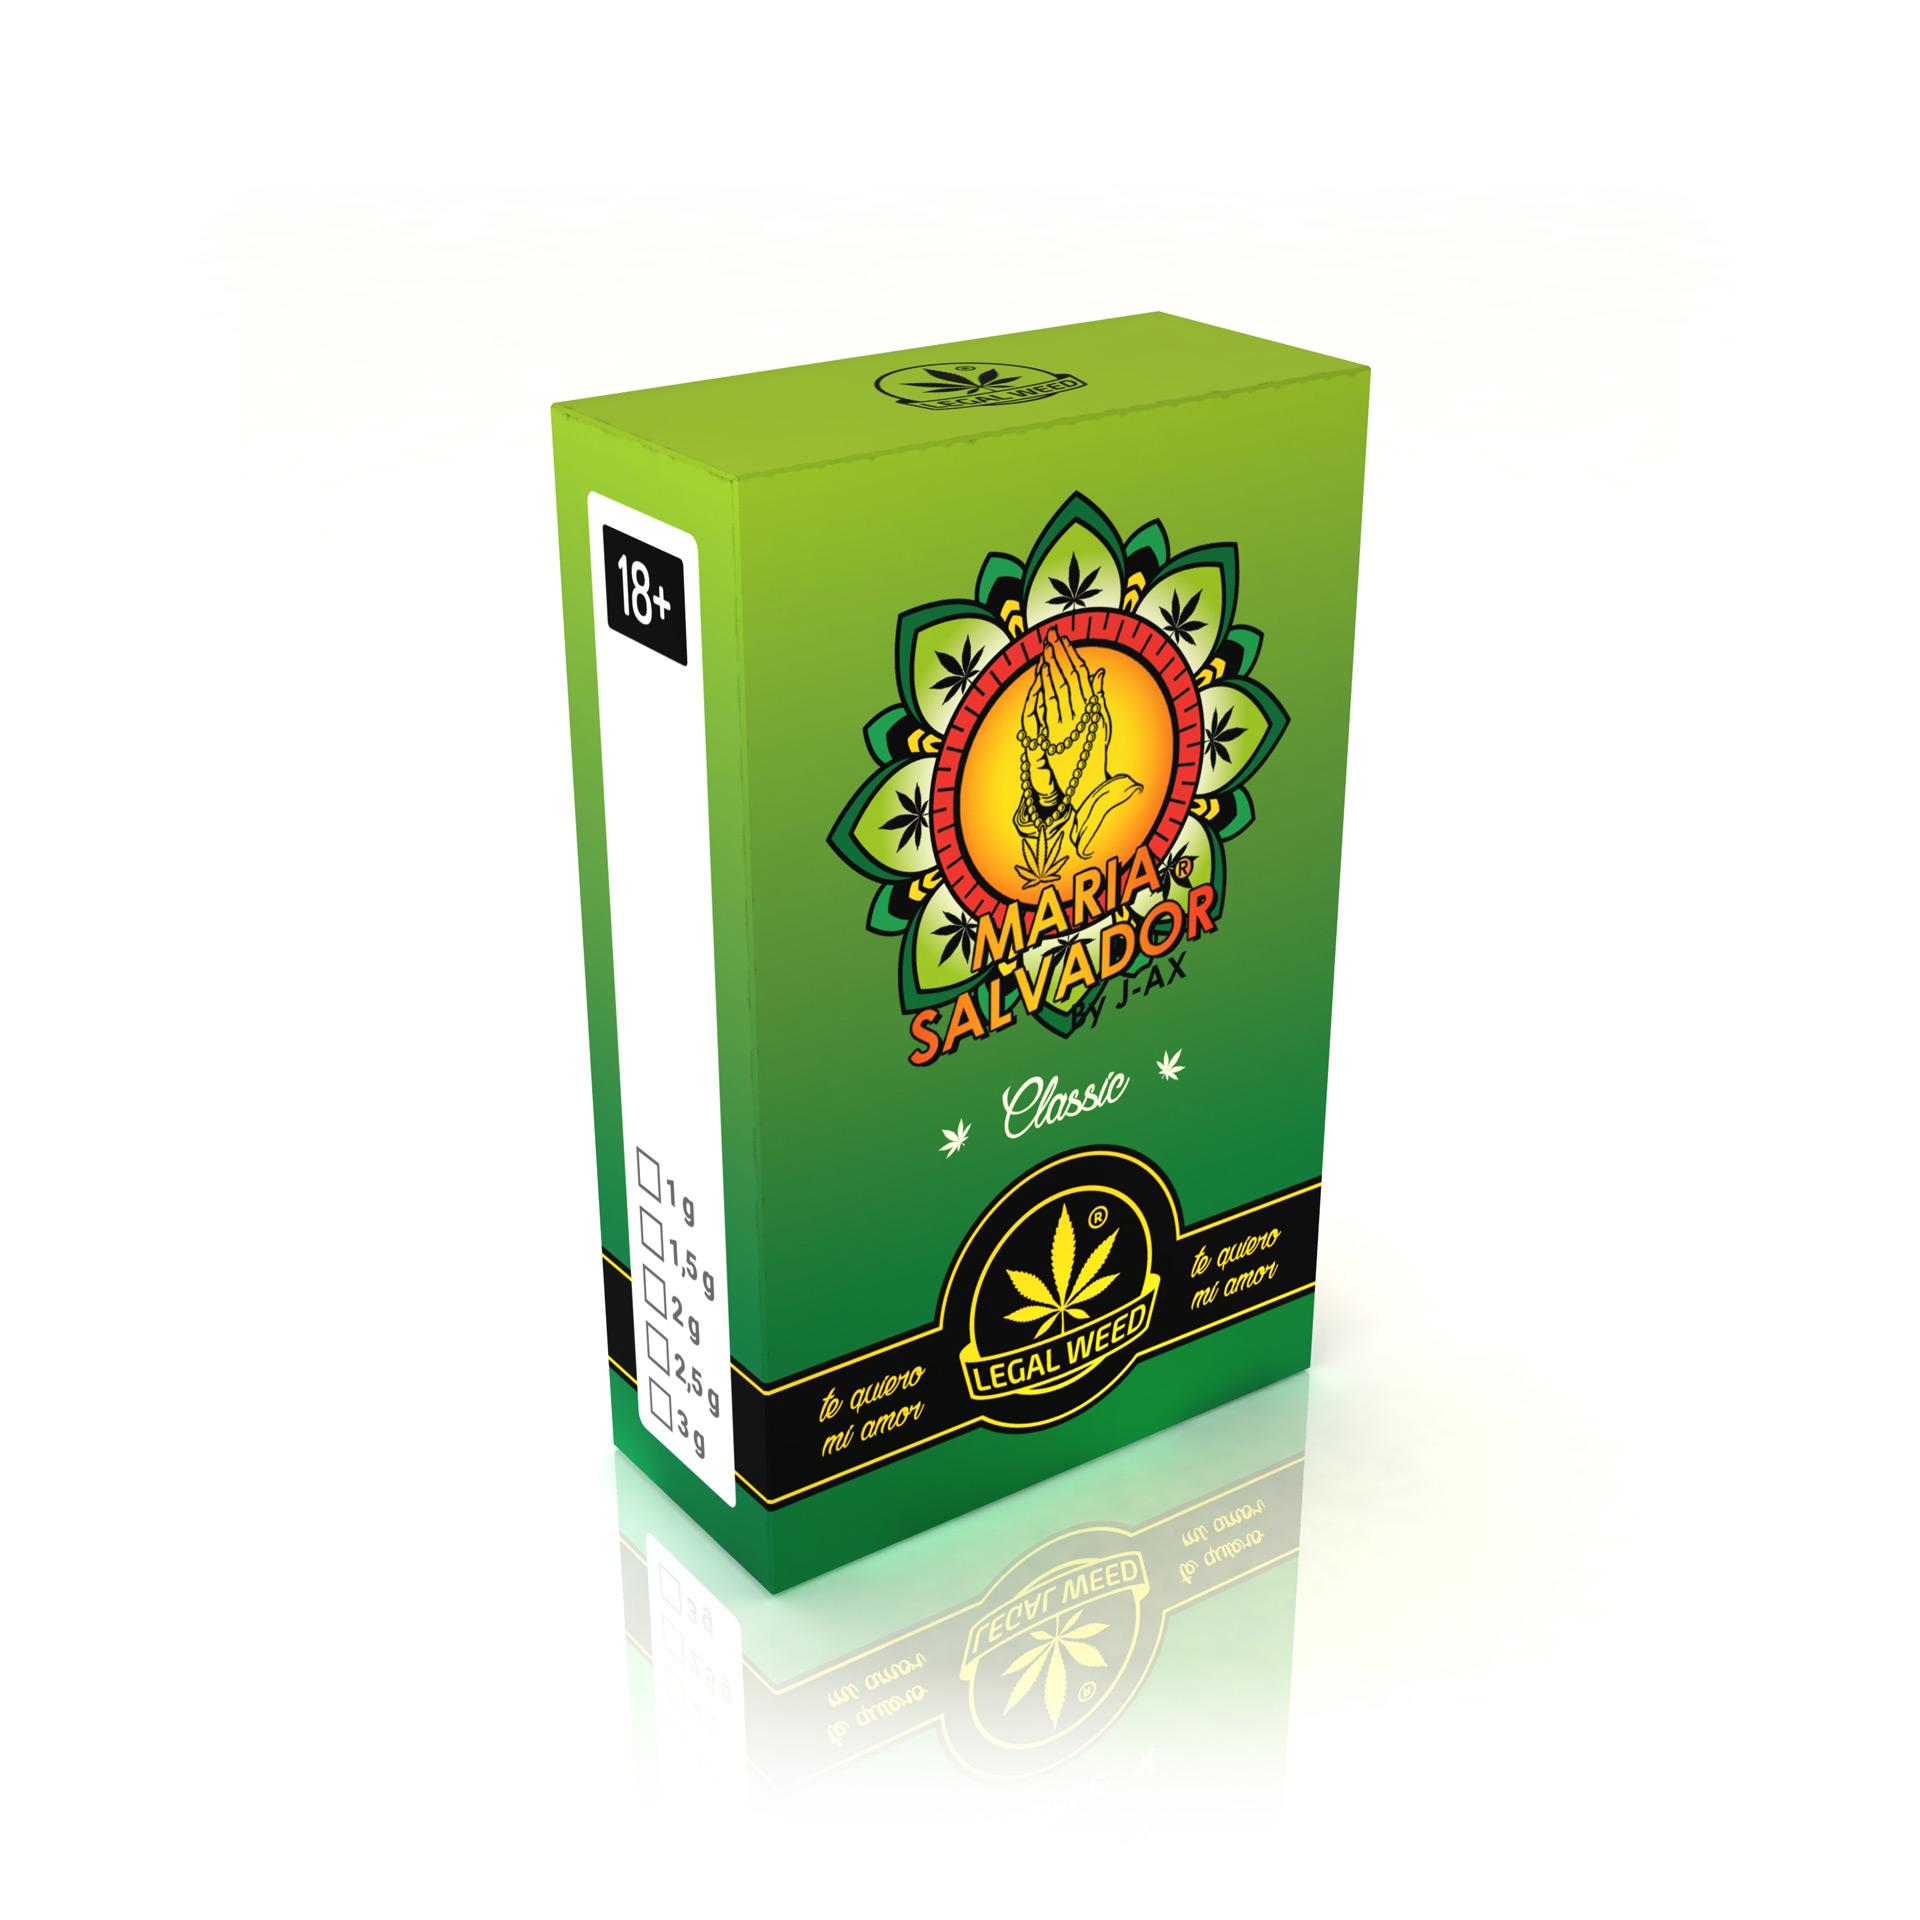 Maria Salvador by J-AX Cannabis Light Legale